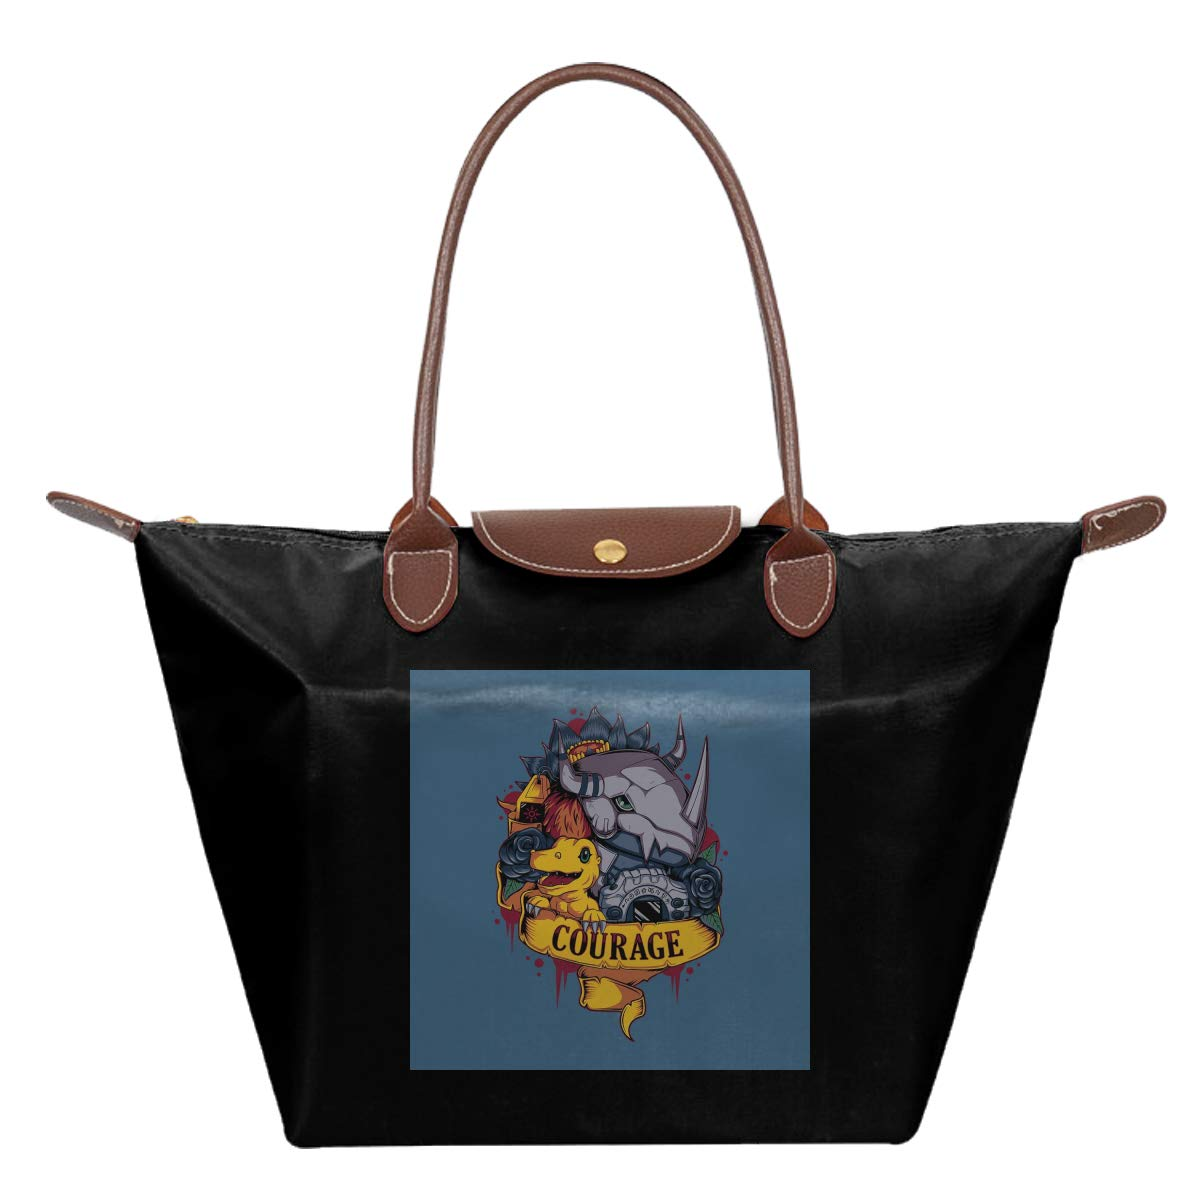 Courage Tattoo Style Greymon Dig-imon Waterproof Leather Folded Messenger Nylon Bag Travel Tote Hopping Folding School Handbags